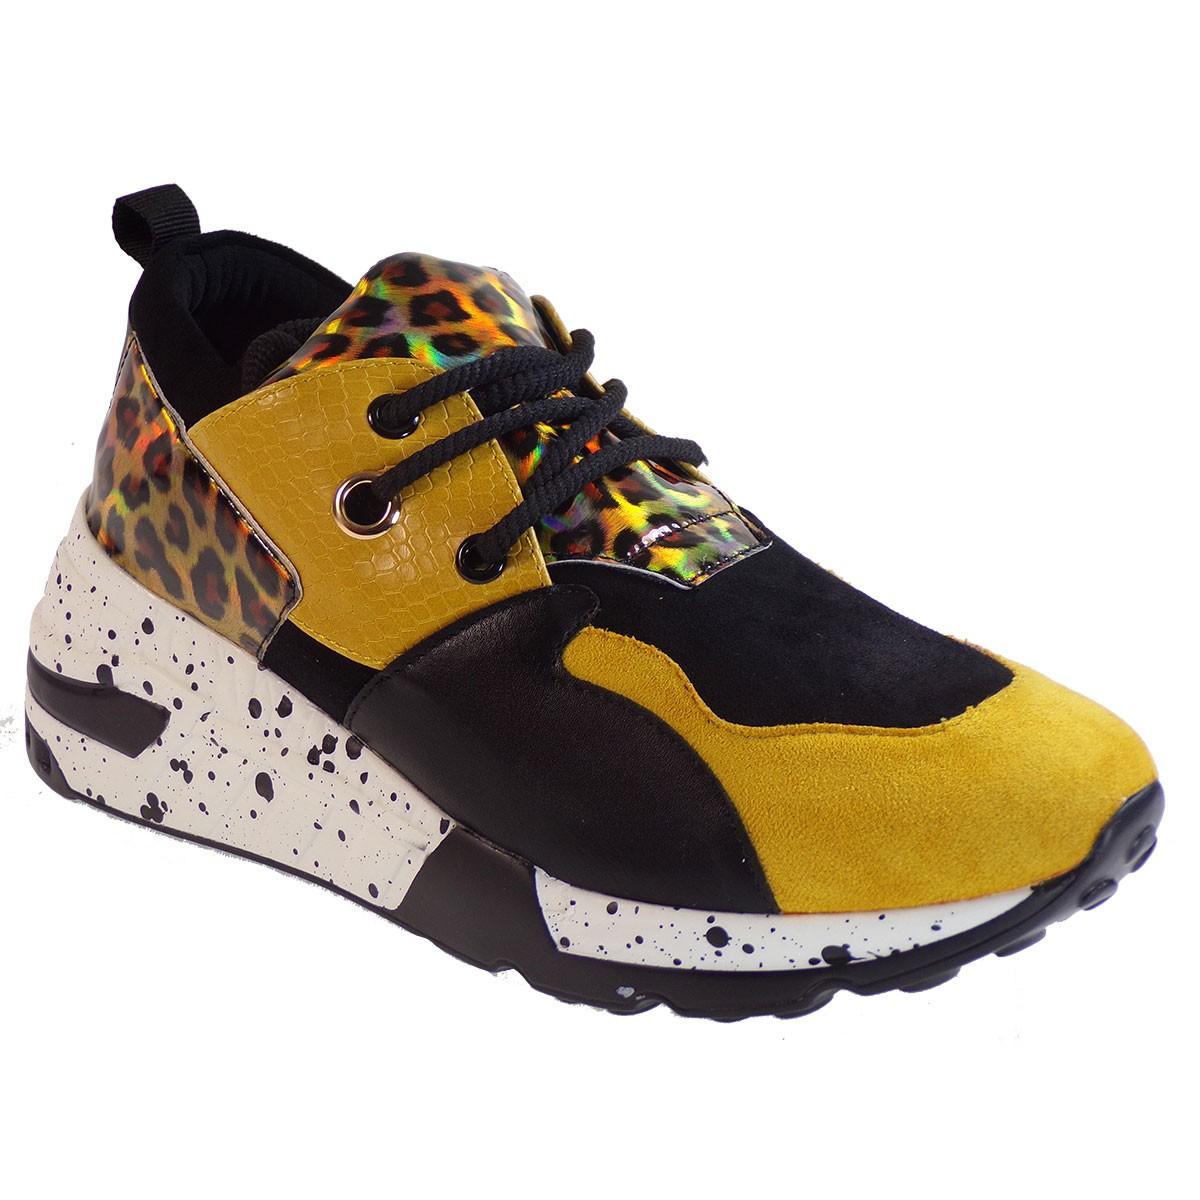 Bagiota Shoes Γυναικεία Παπούτσια Sneakers Αθλητικά H8956 Κίτρινο